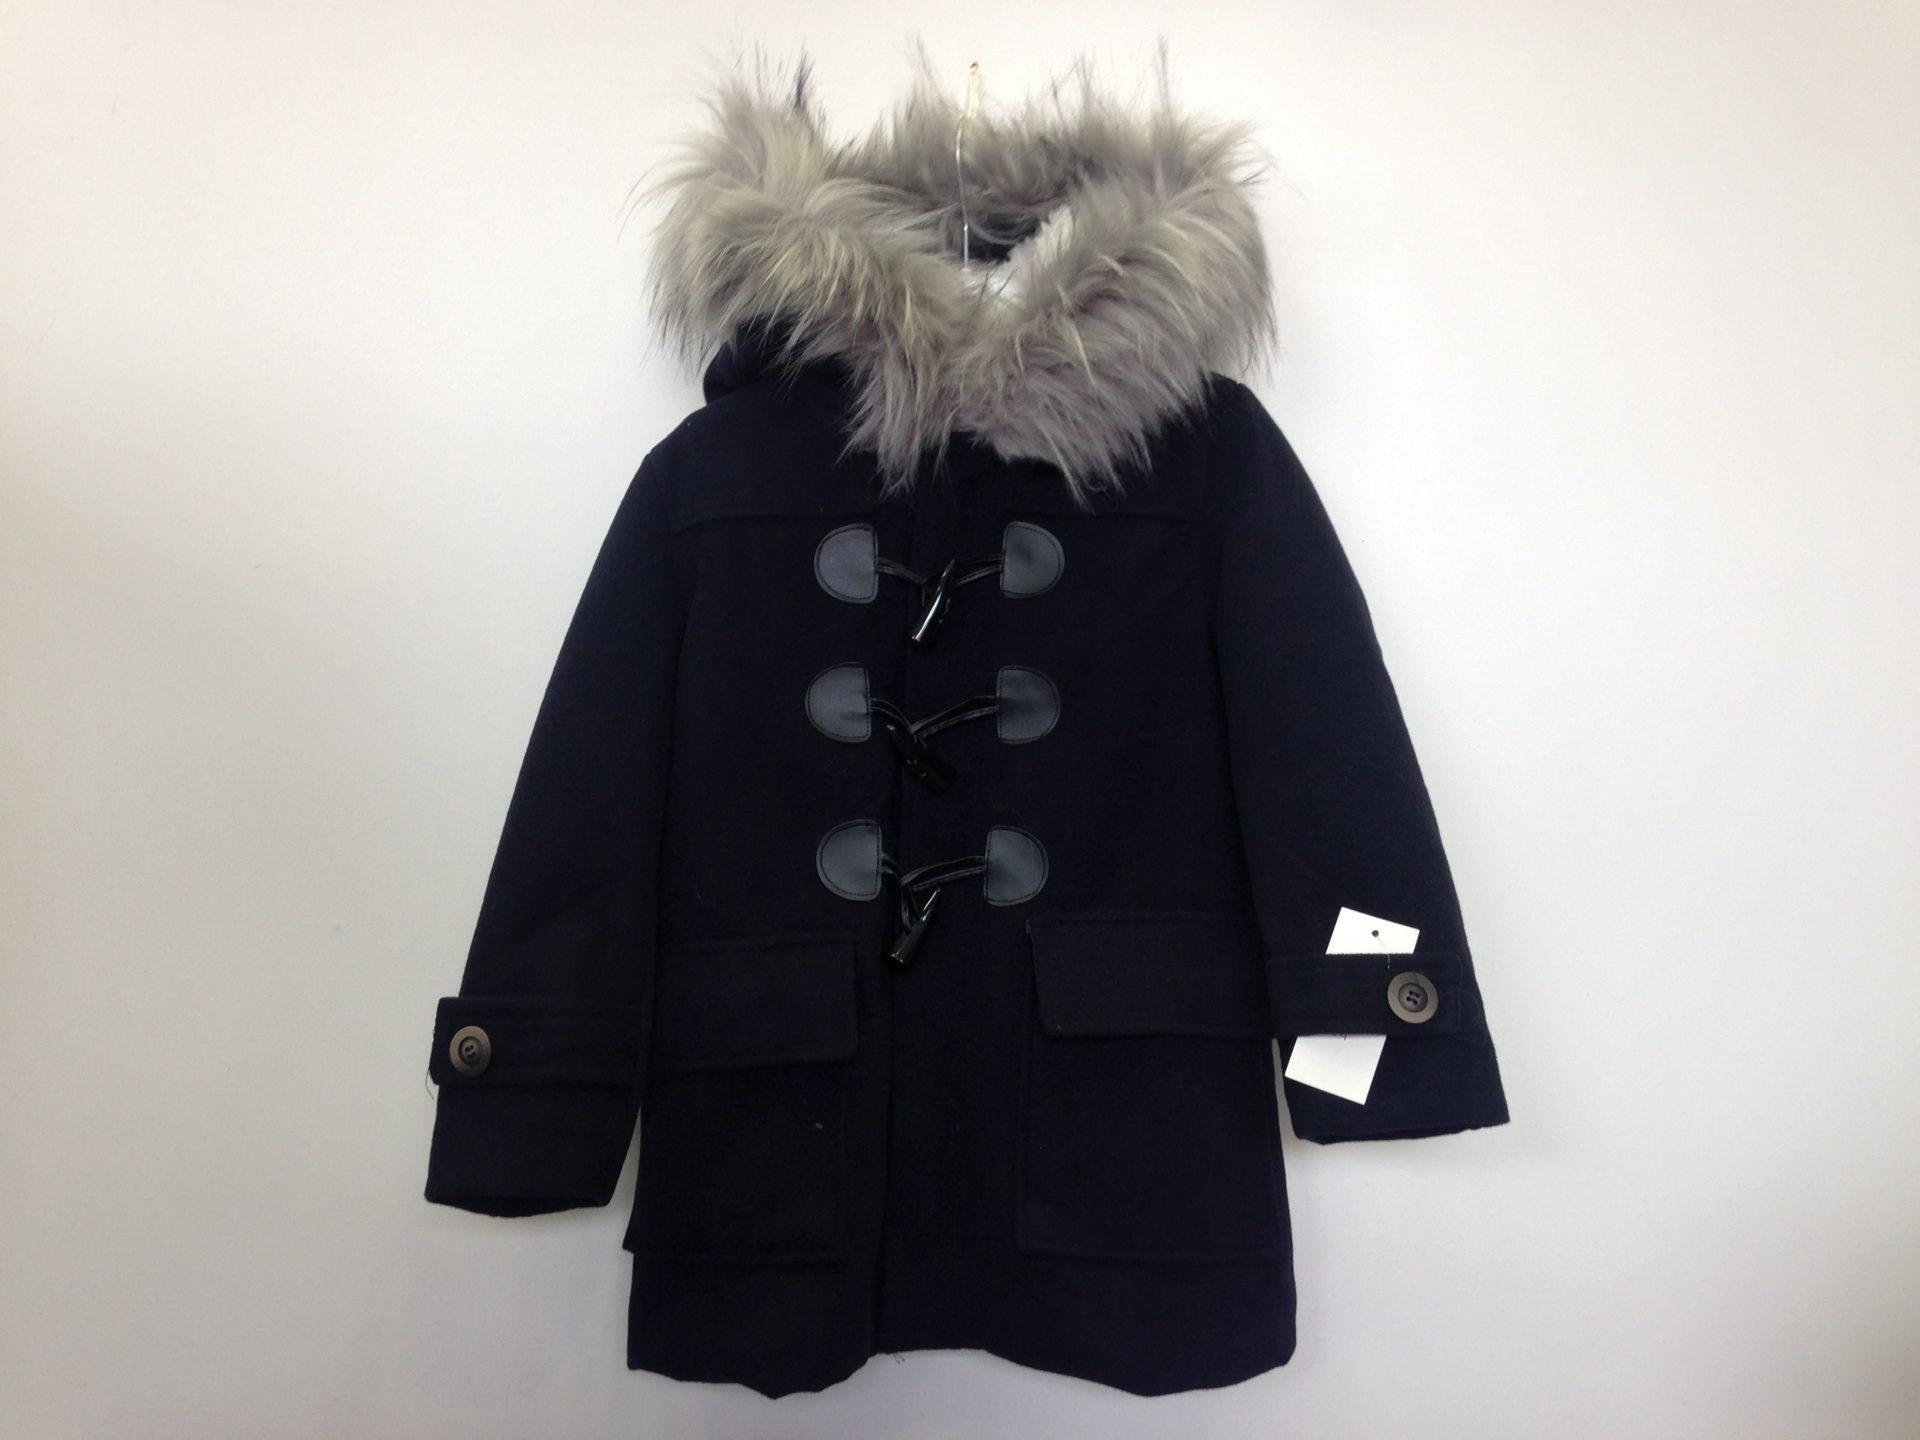 042d812a037 Παλτό μπλε unisex με γούνα στη κουκούλα και εσ. επένδυση γούνας ...